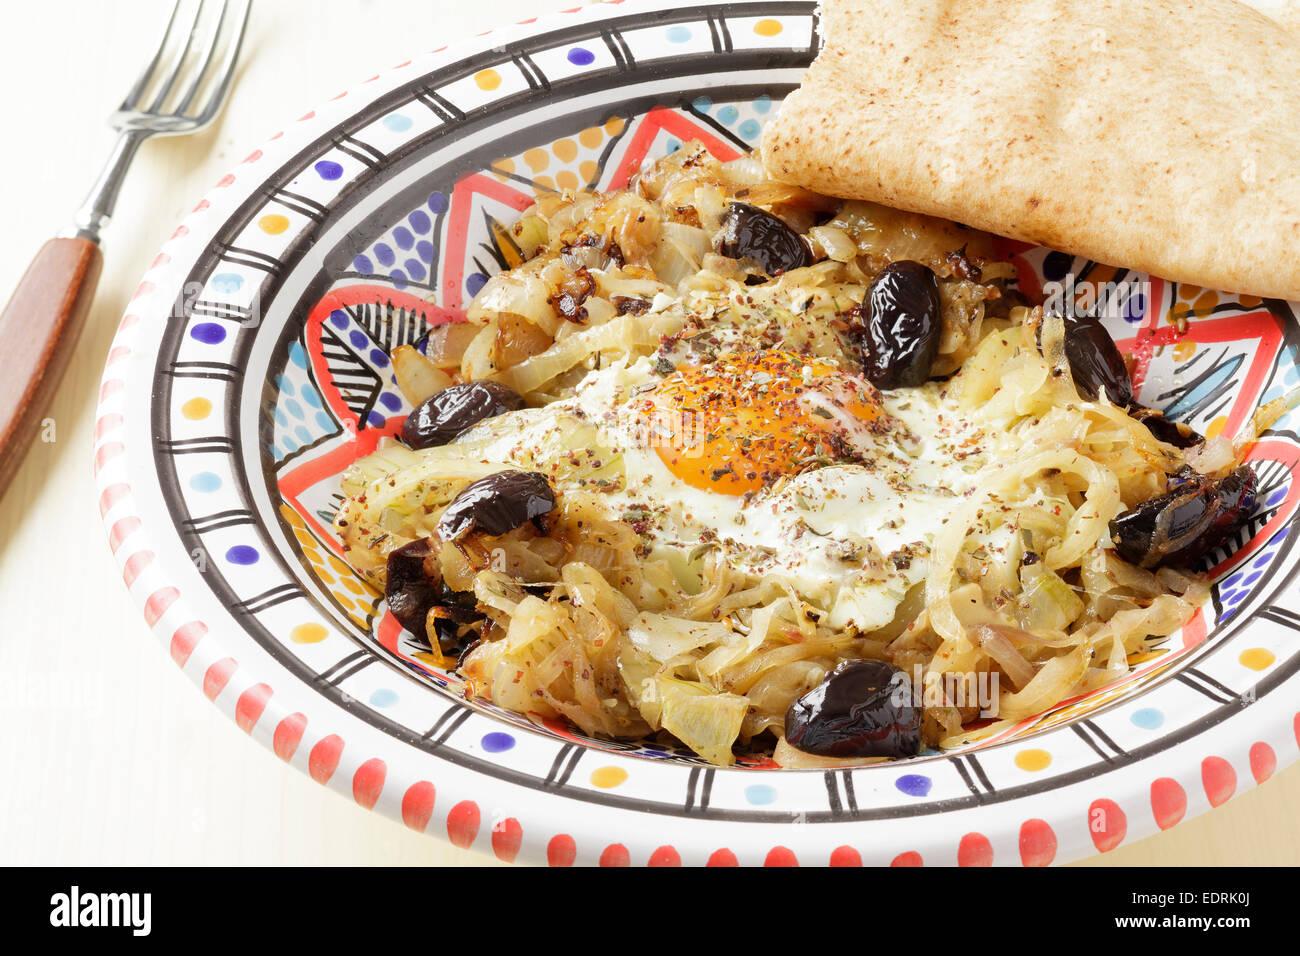 Plat marocain des oignons, ail, piments, olives noires, oeuf et za'atar Photo Stock